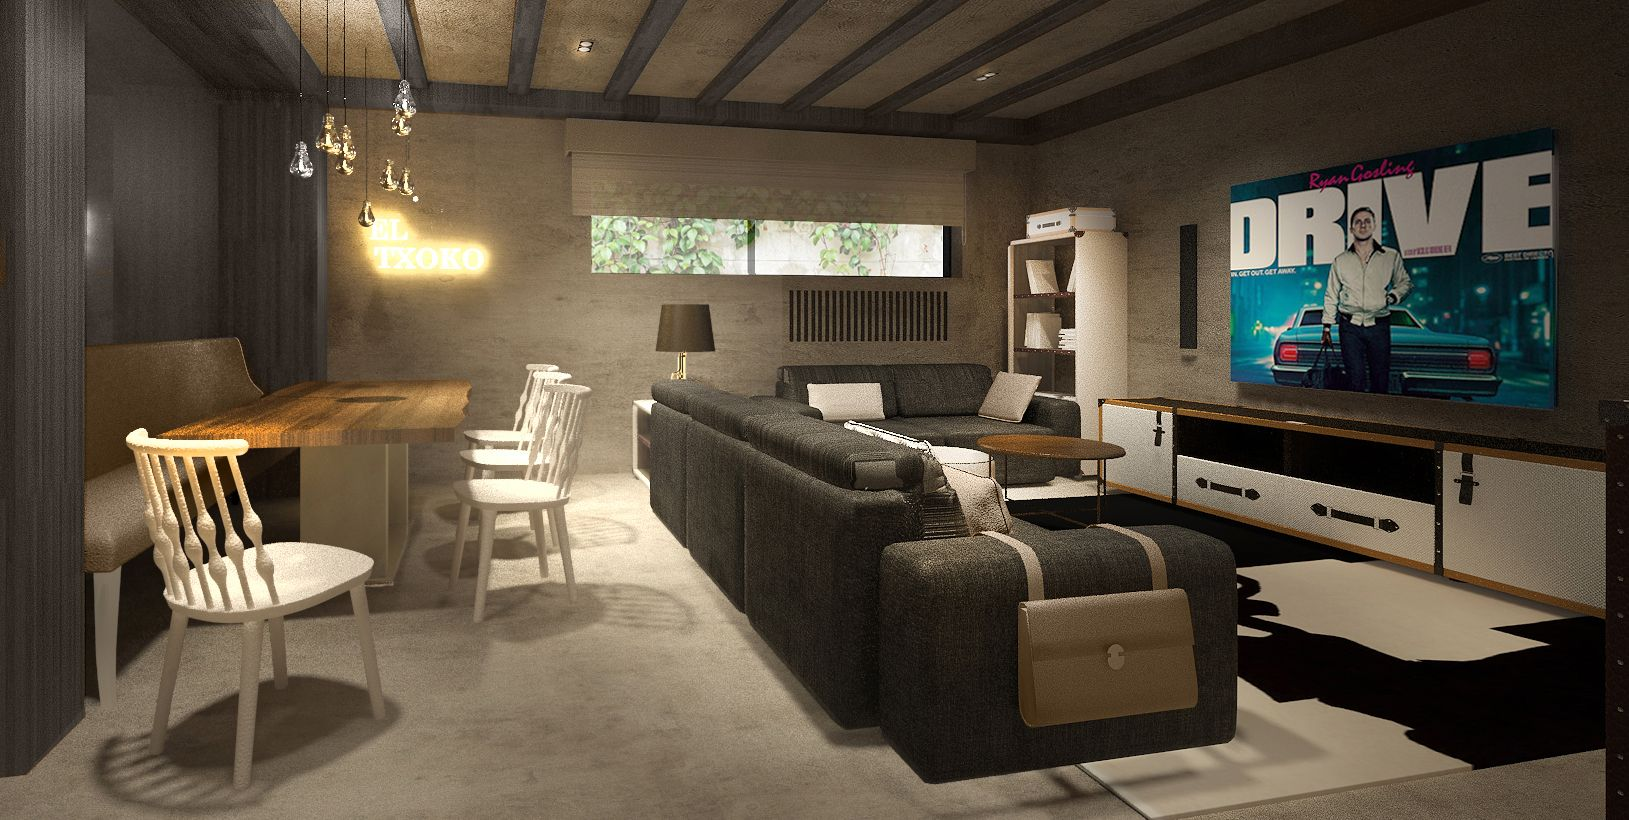 home theater sofas uk broyhill laramie sofa and loveseat set brown cinema seating recliner theatre luxury